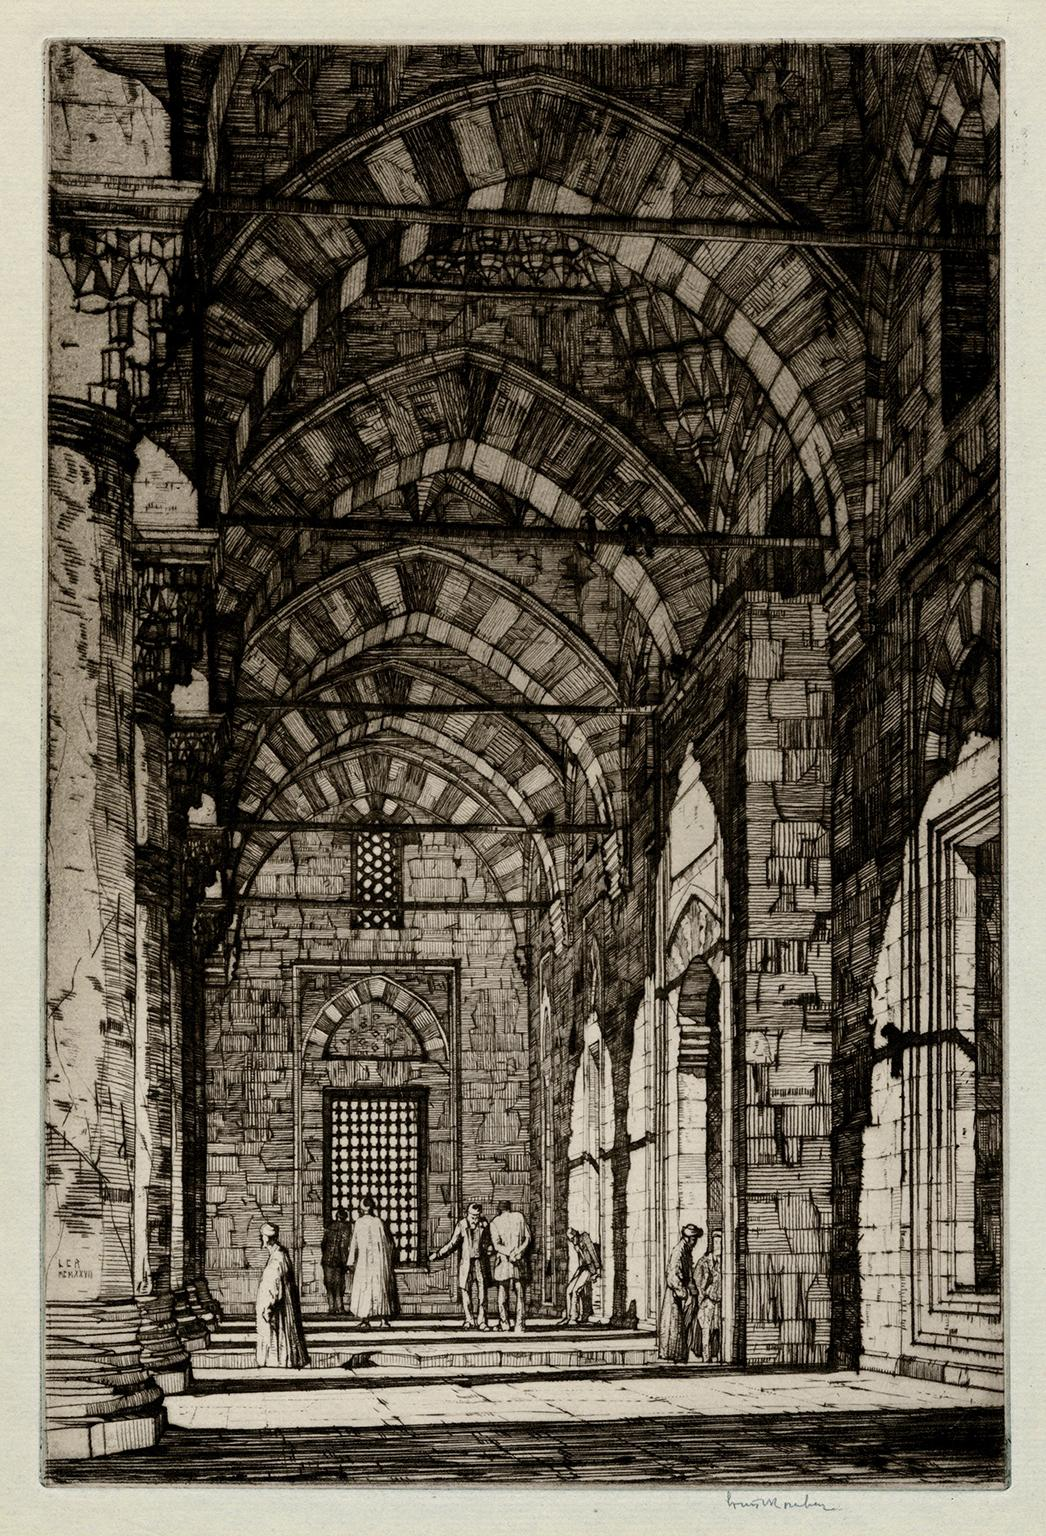 Mosque of the Sultan Bayazid, Constantinople